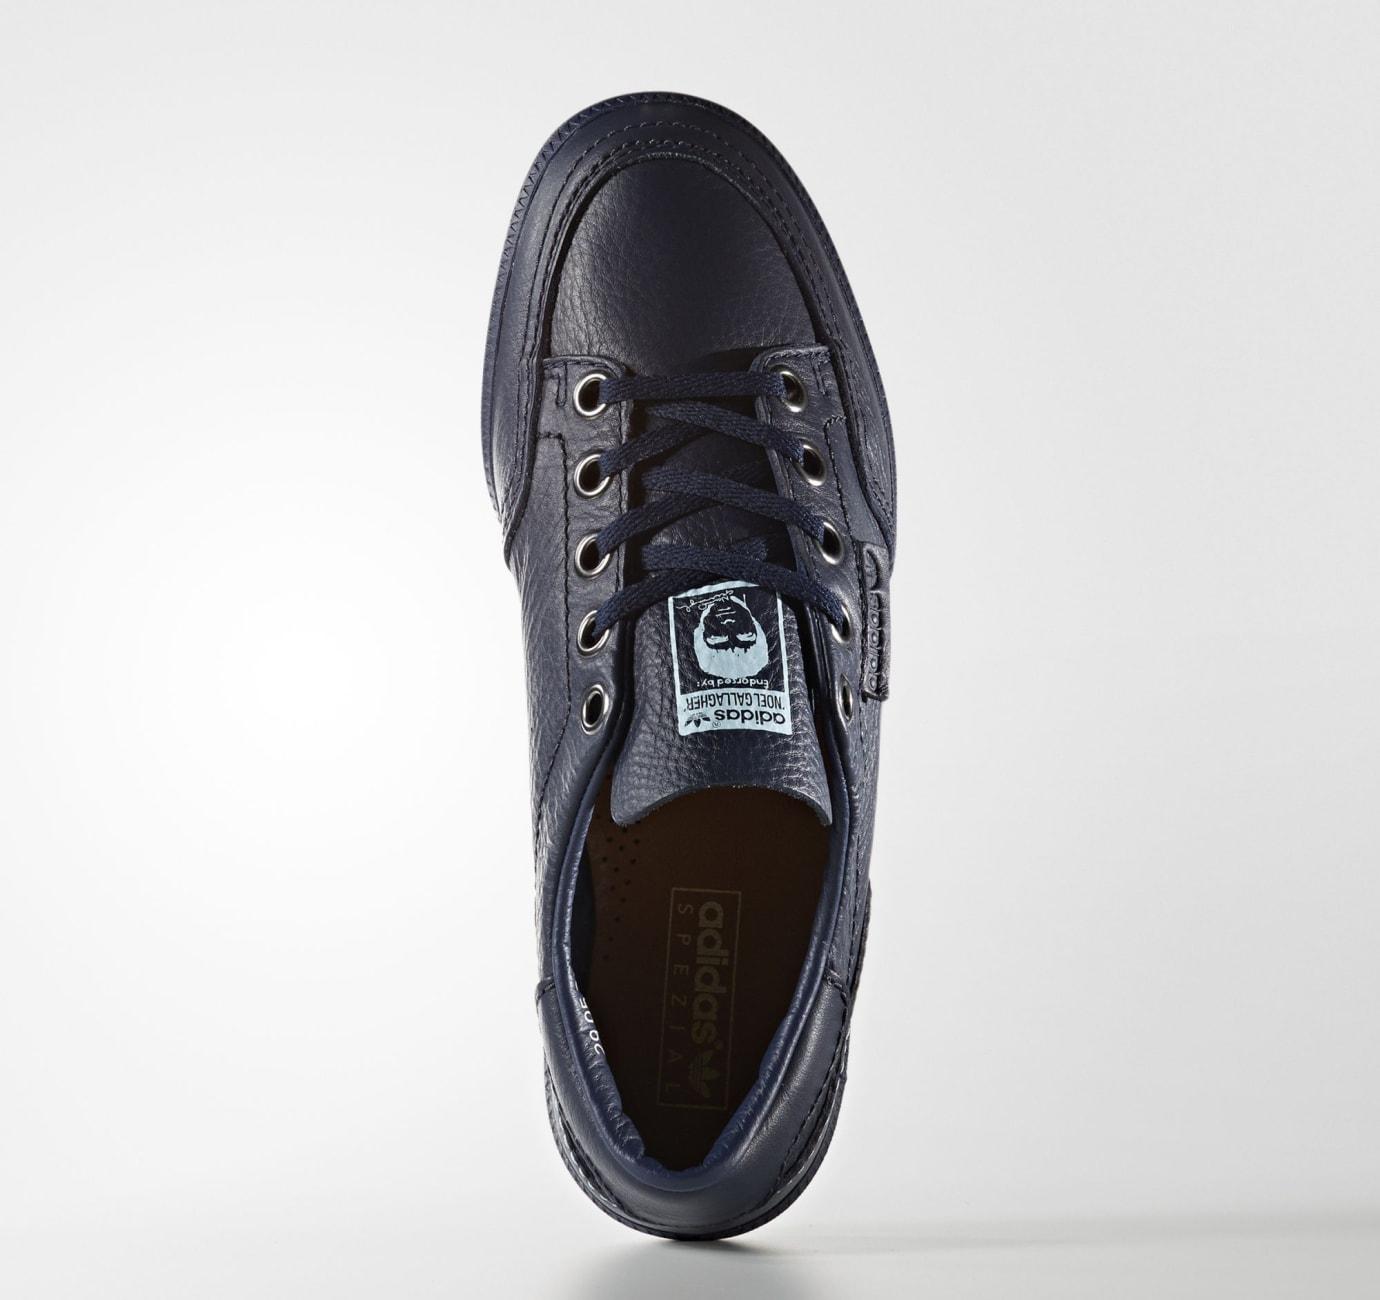 buy popular 59862 d7caa Noel Gallagher Adidas Garwen Spezial | Sole Collector